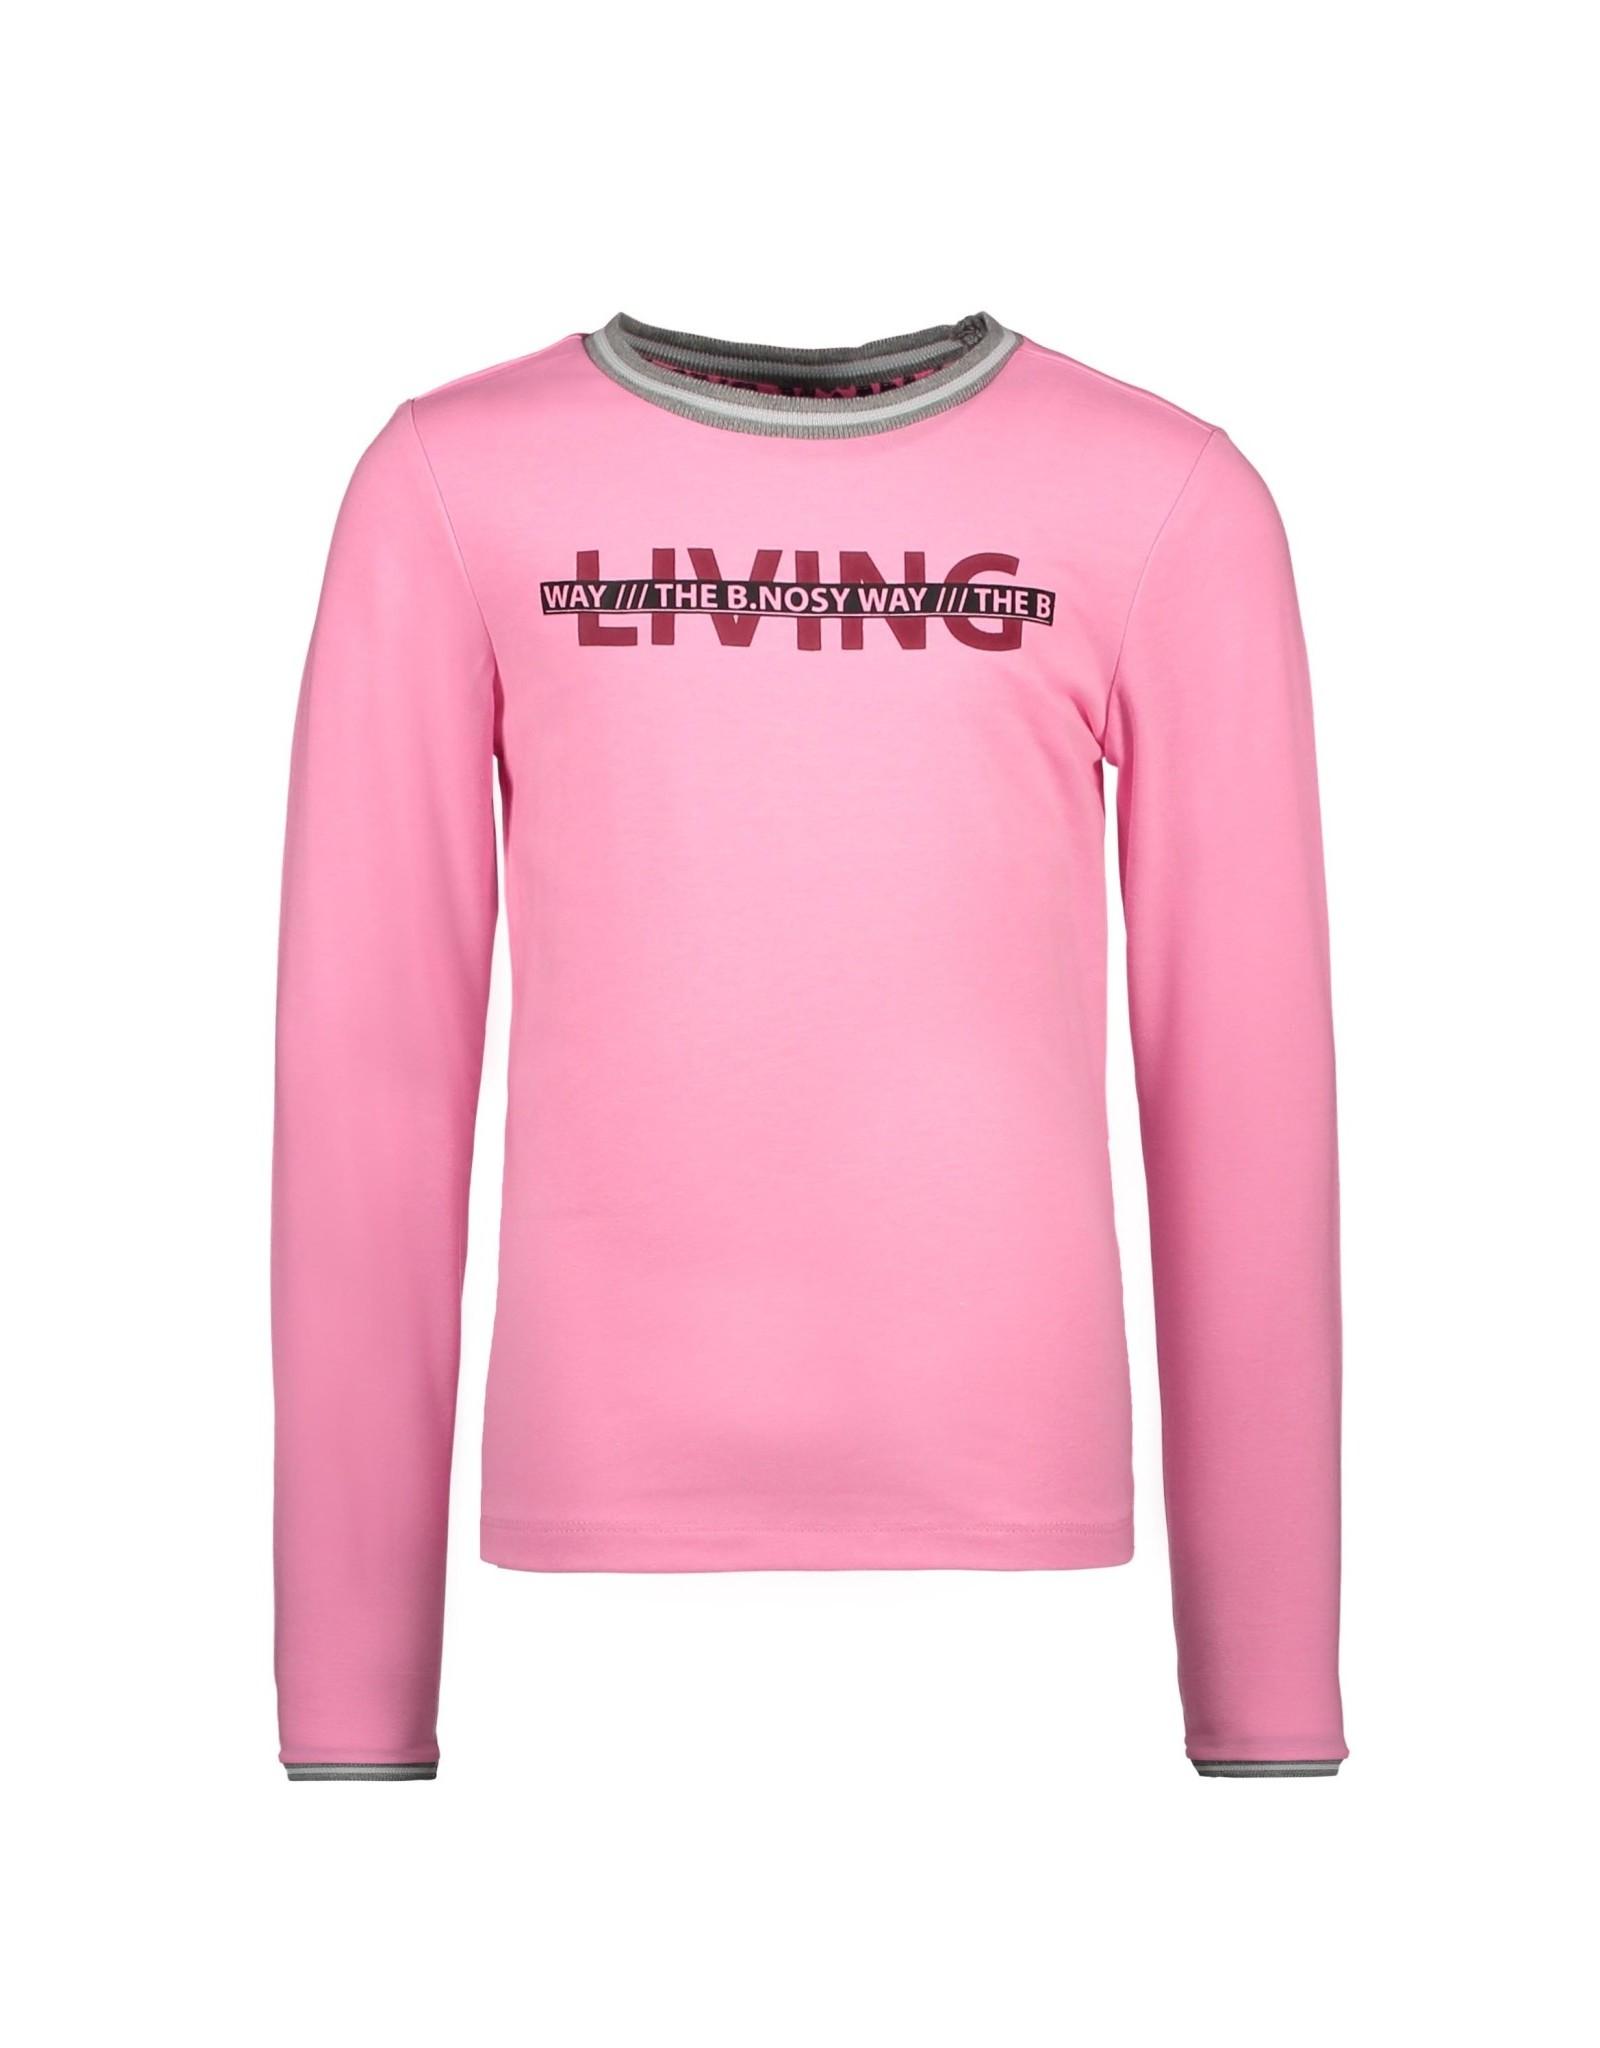 B.Nosy B.Nosy meisjes shirt Living Sorbet